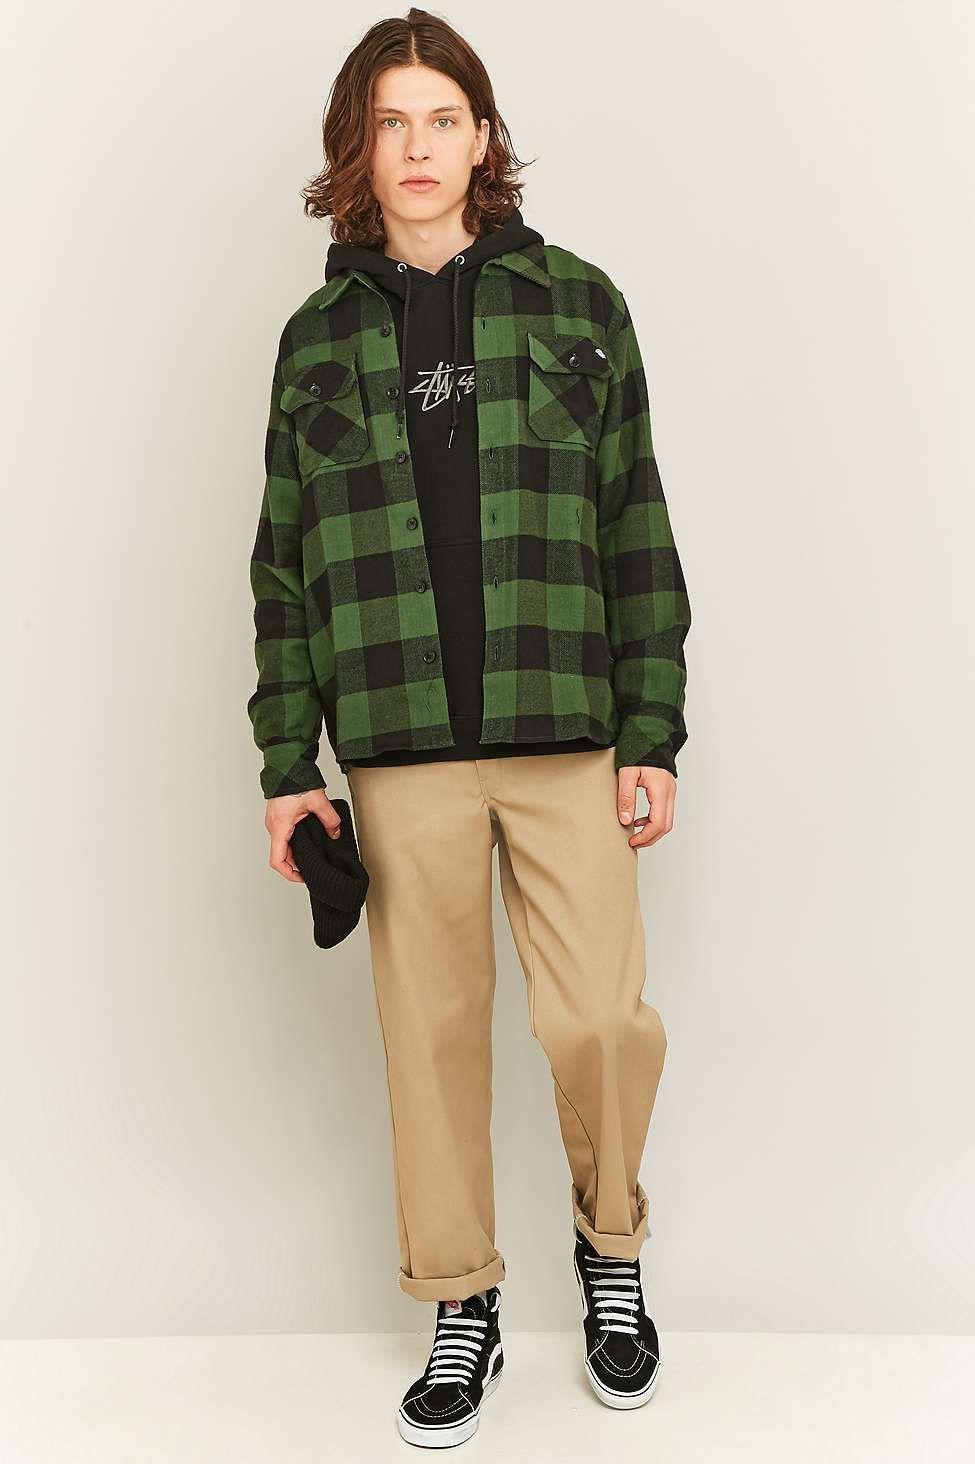 7a3e03b136832 Dickies Sacramento Pine Green Check Shirt - Urban Outfitters ...